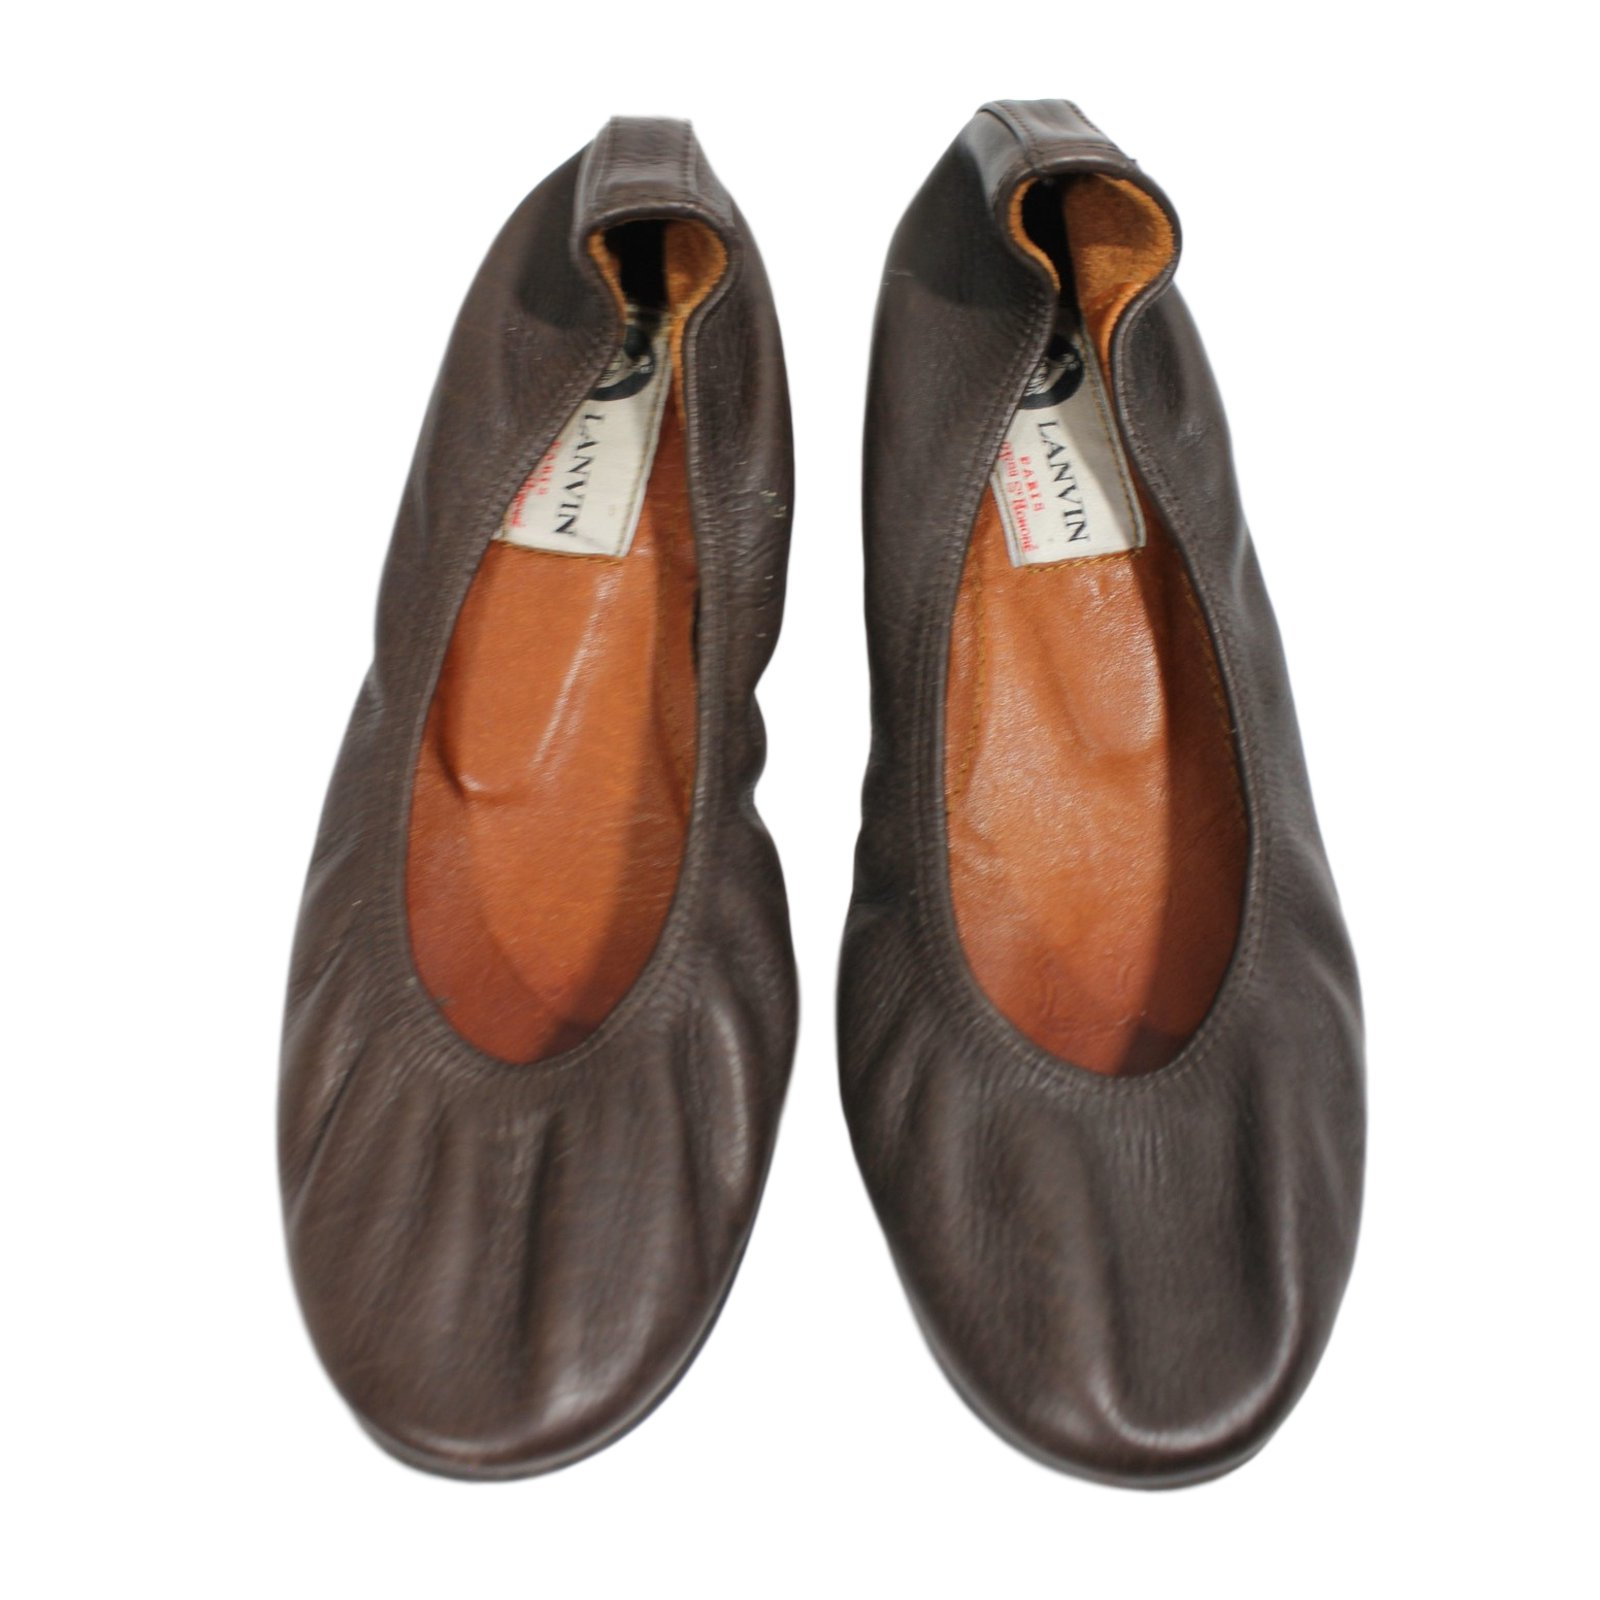 Lanvin Ballerinas Ballet flats Leather